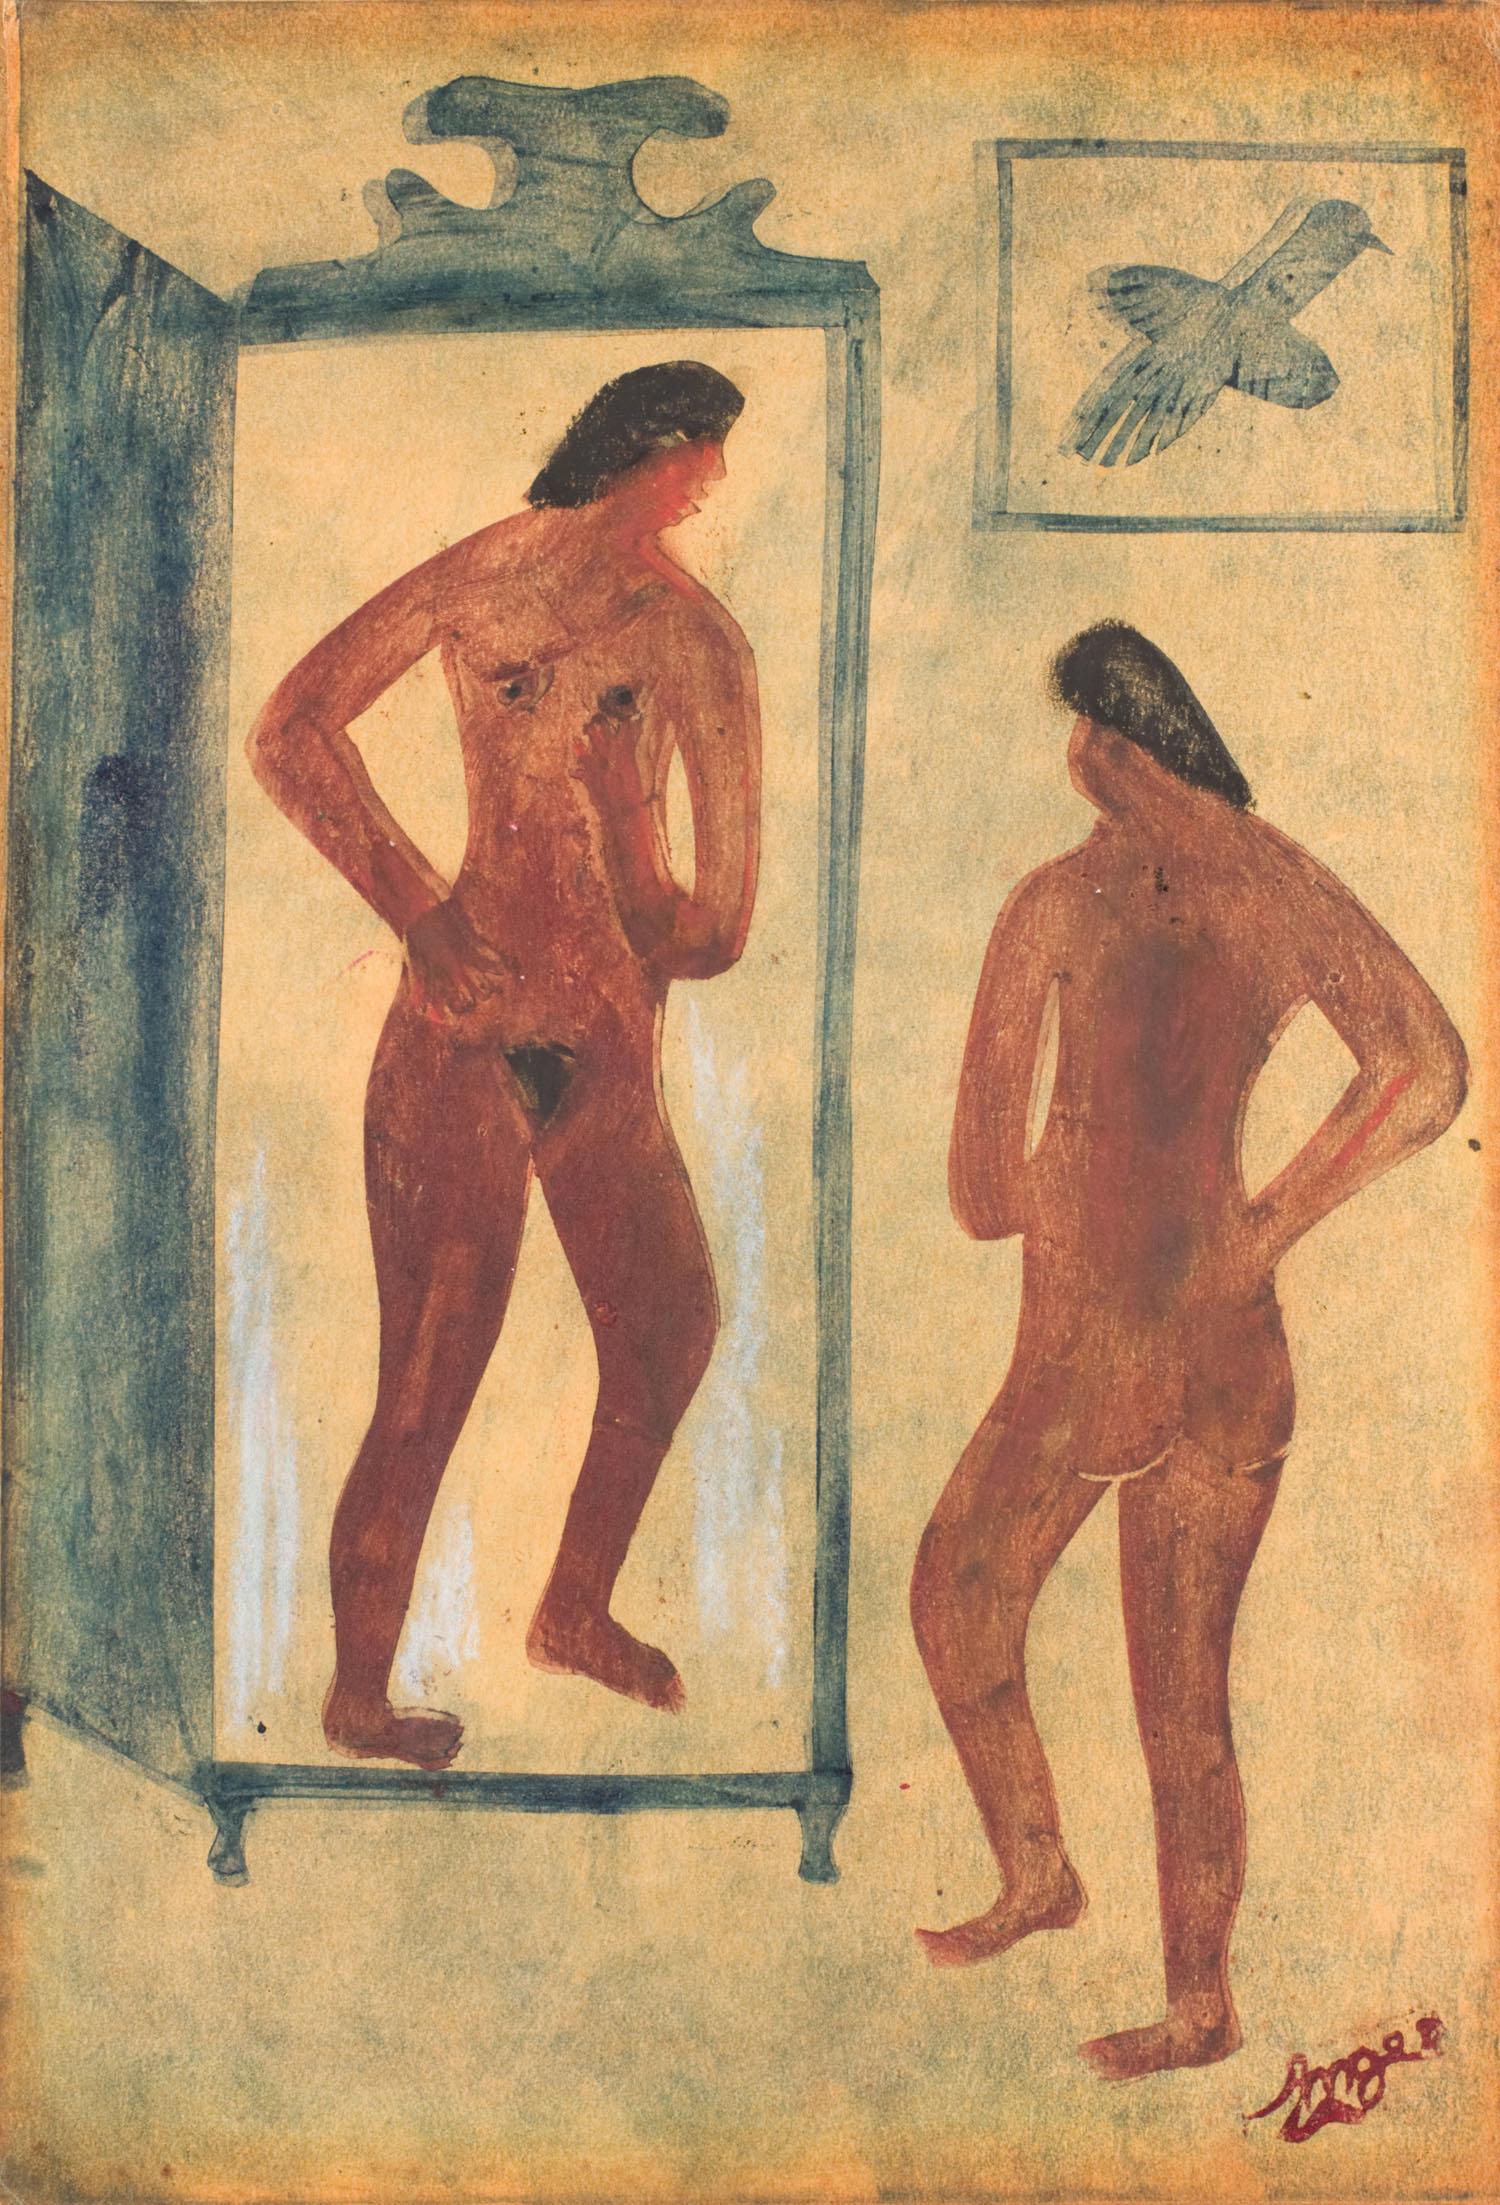 Nu devant un miroir | Nu devant un miroir | Atelier Ange Boaretto